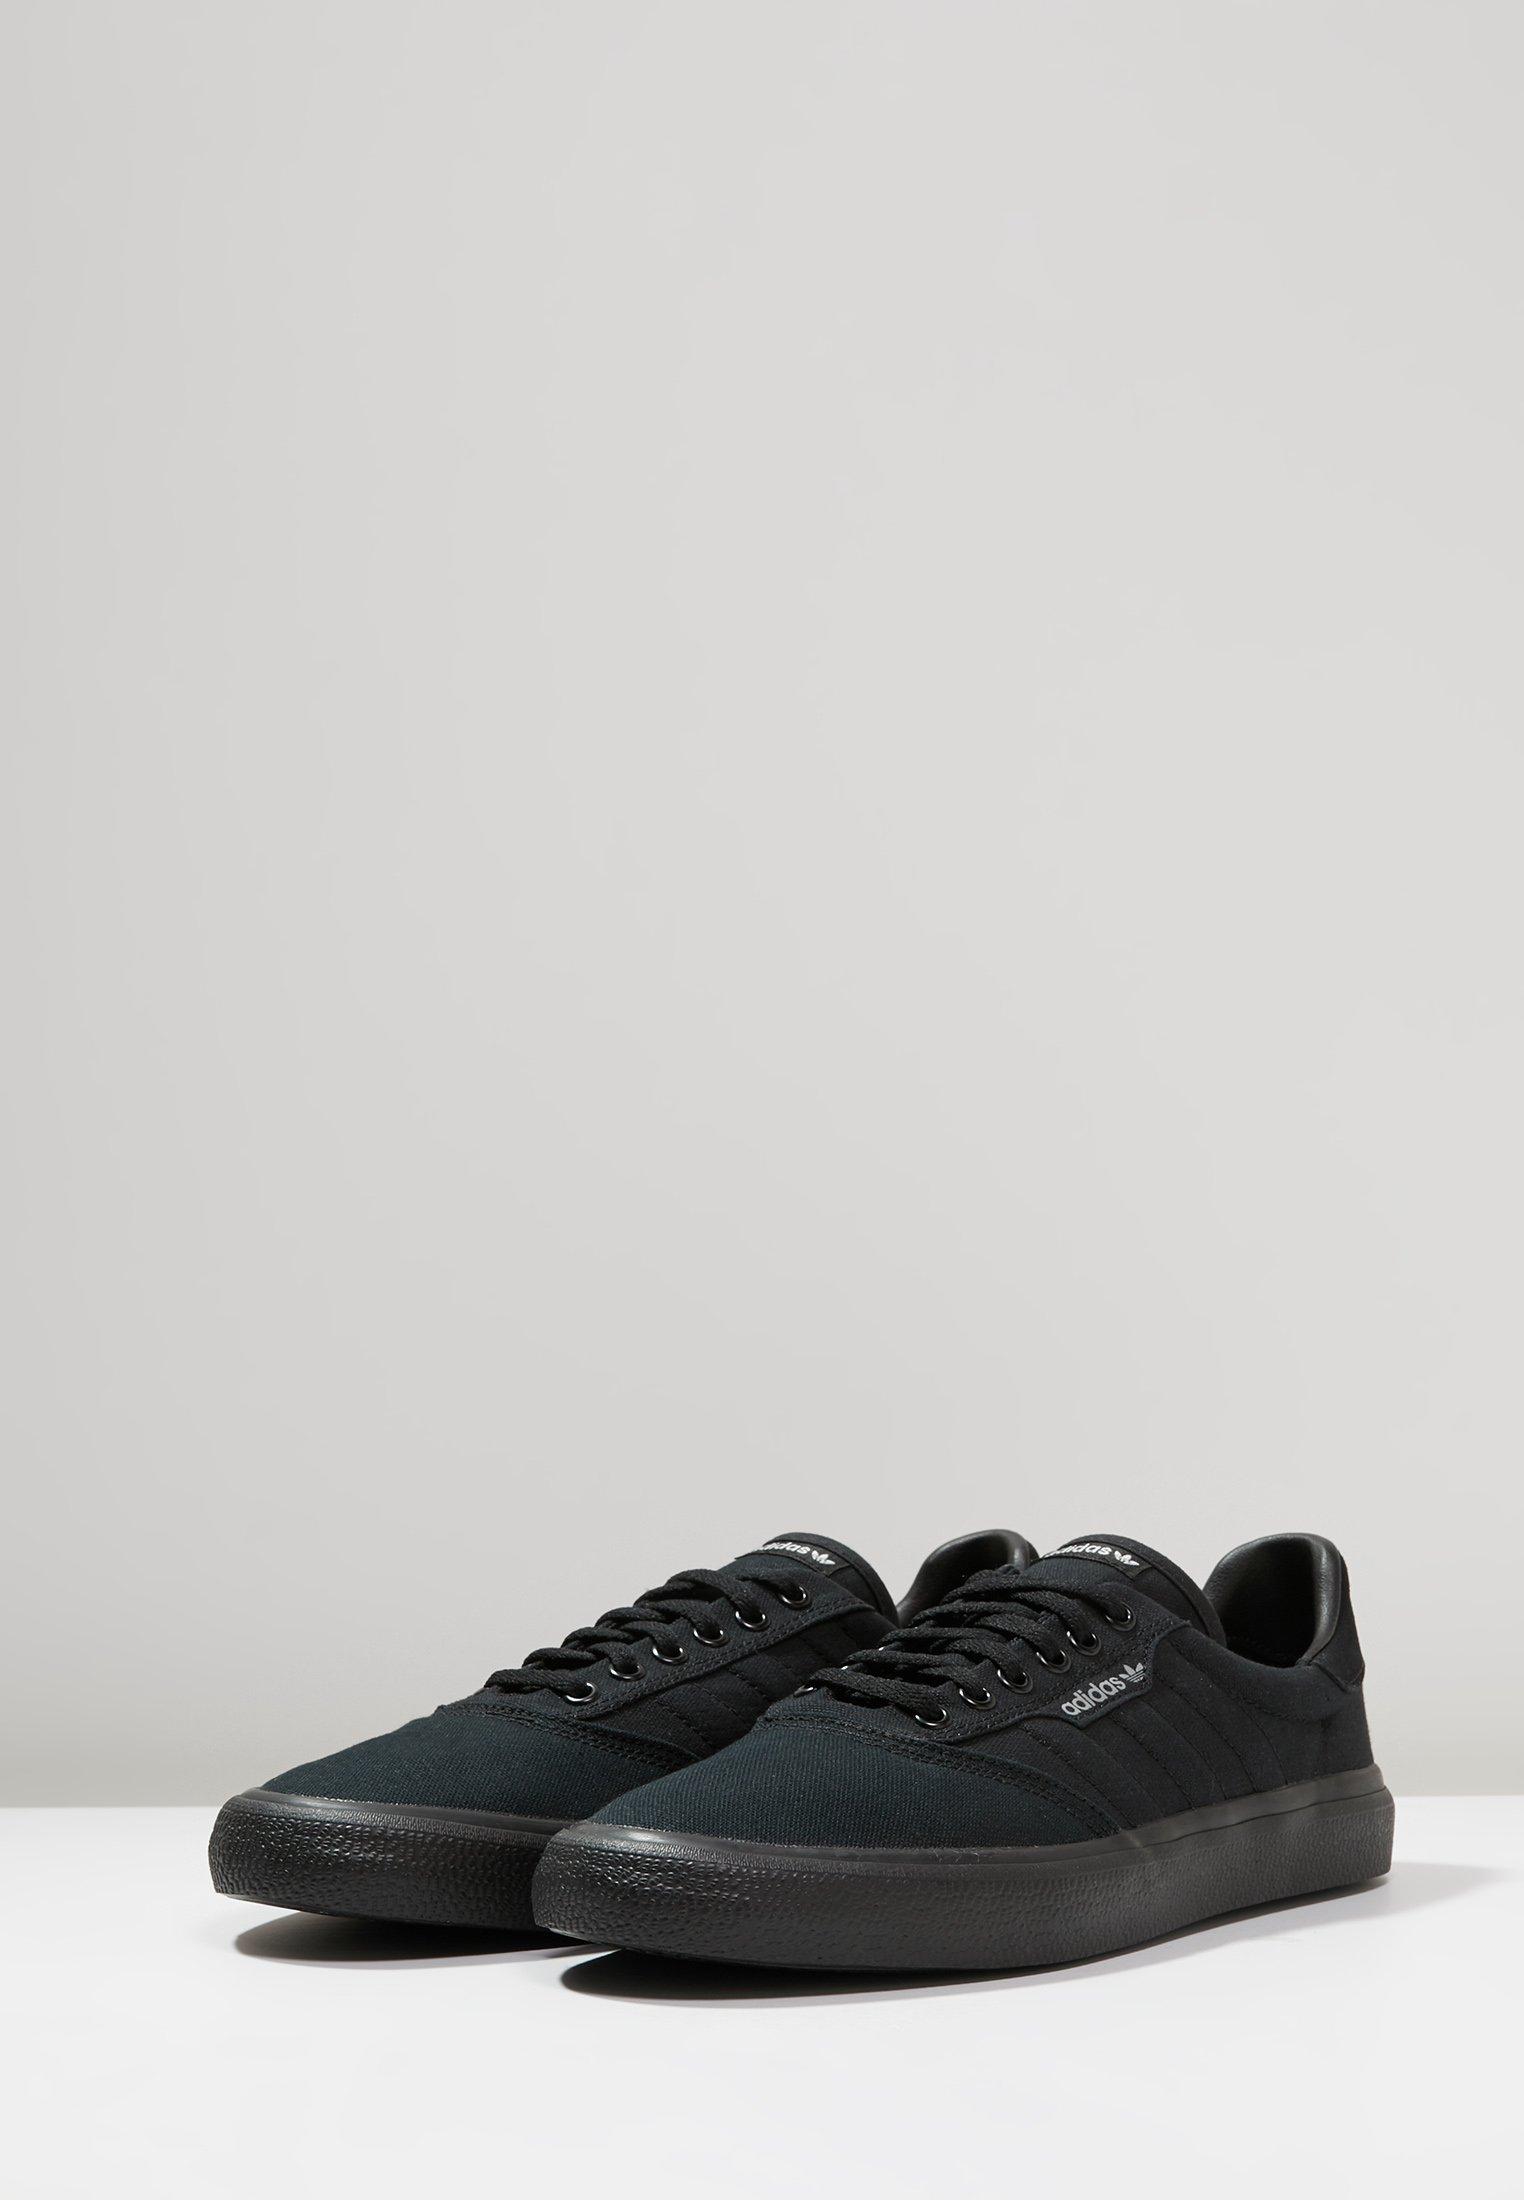 Adidas Originals 3mc - Sneakers Cblack/cblack/gretwo